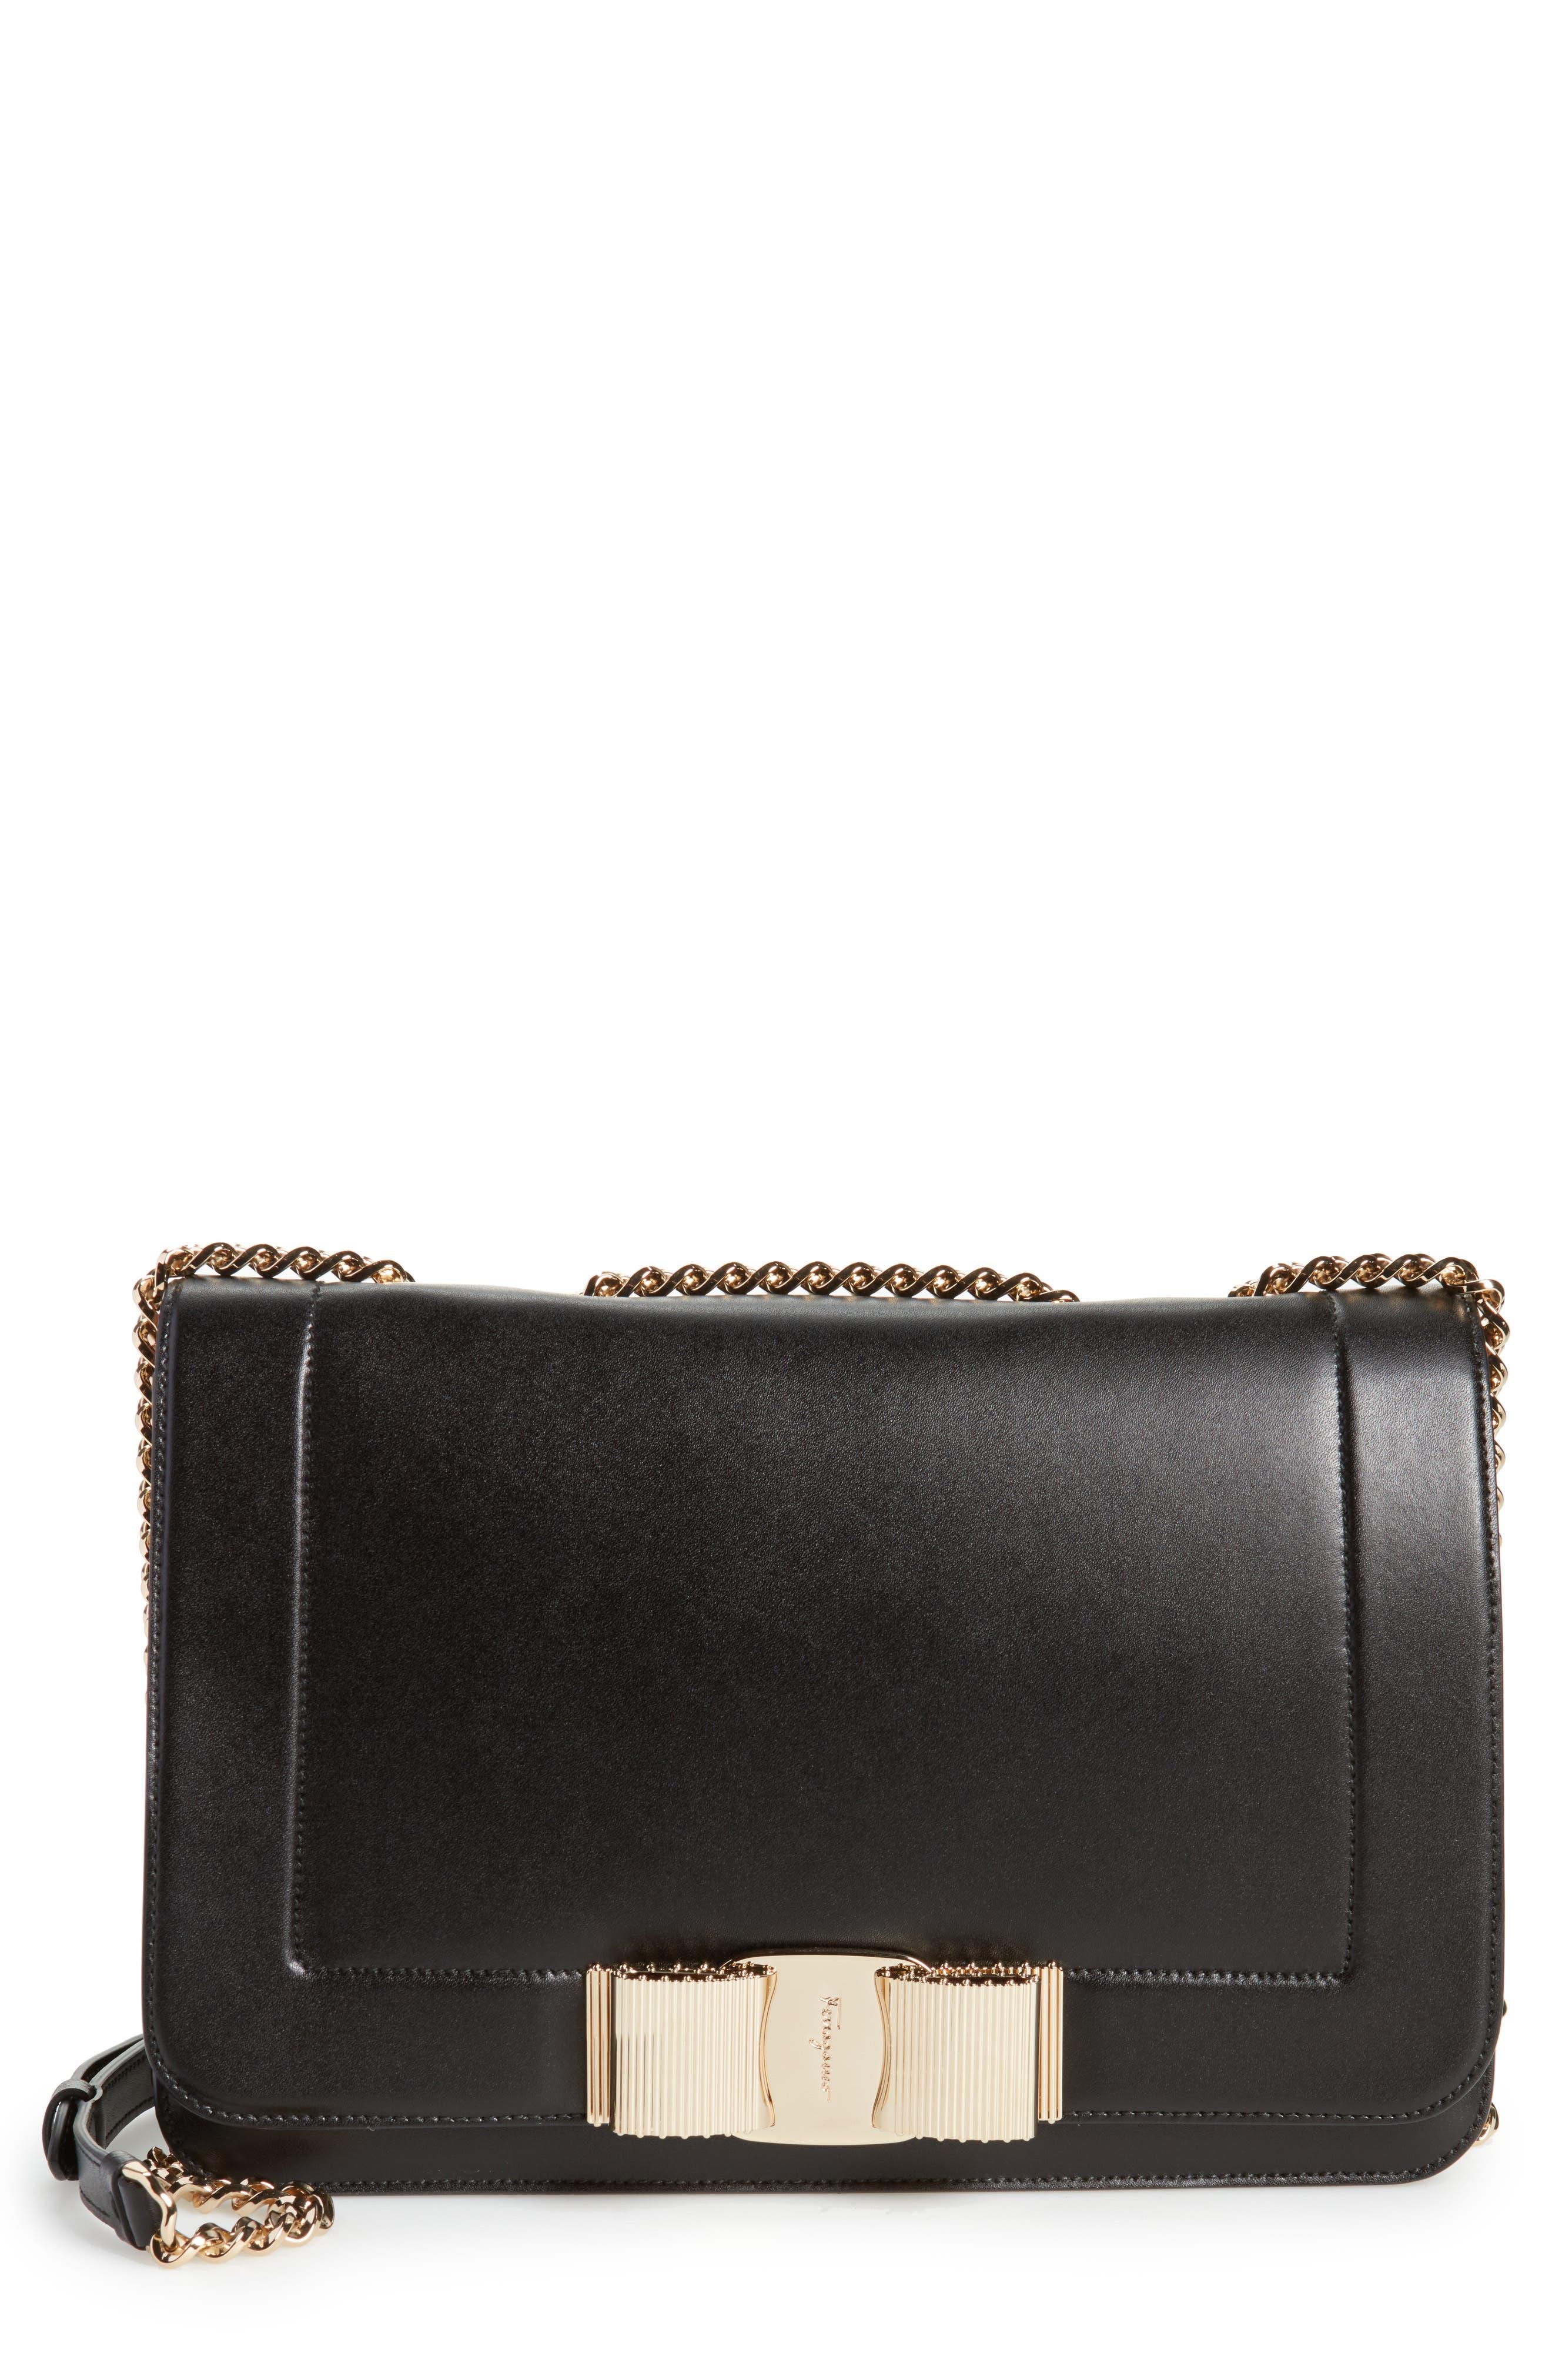 Vara Leather Shoulder Bag,                             Main thumbnail 1, color,                             Nero/ Bonbon